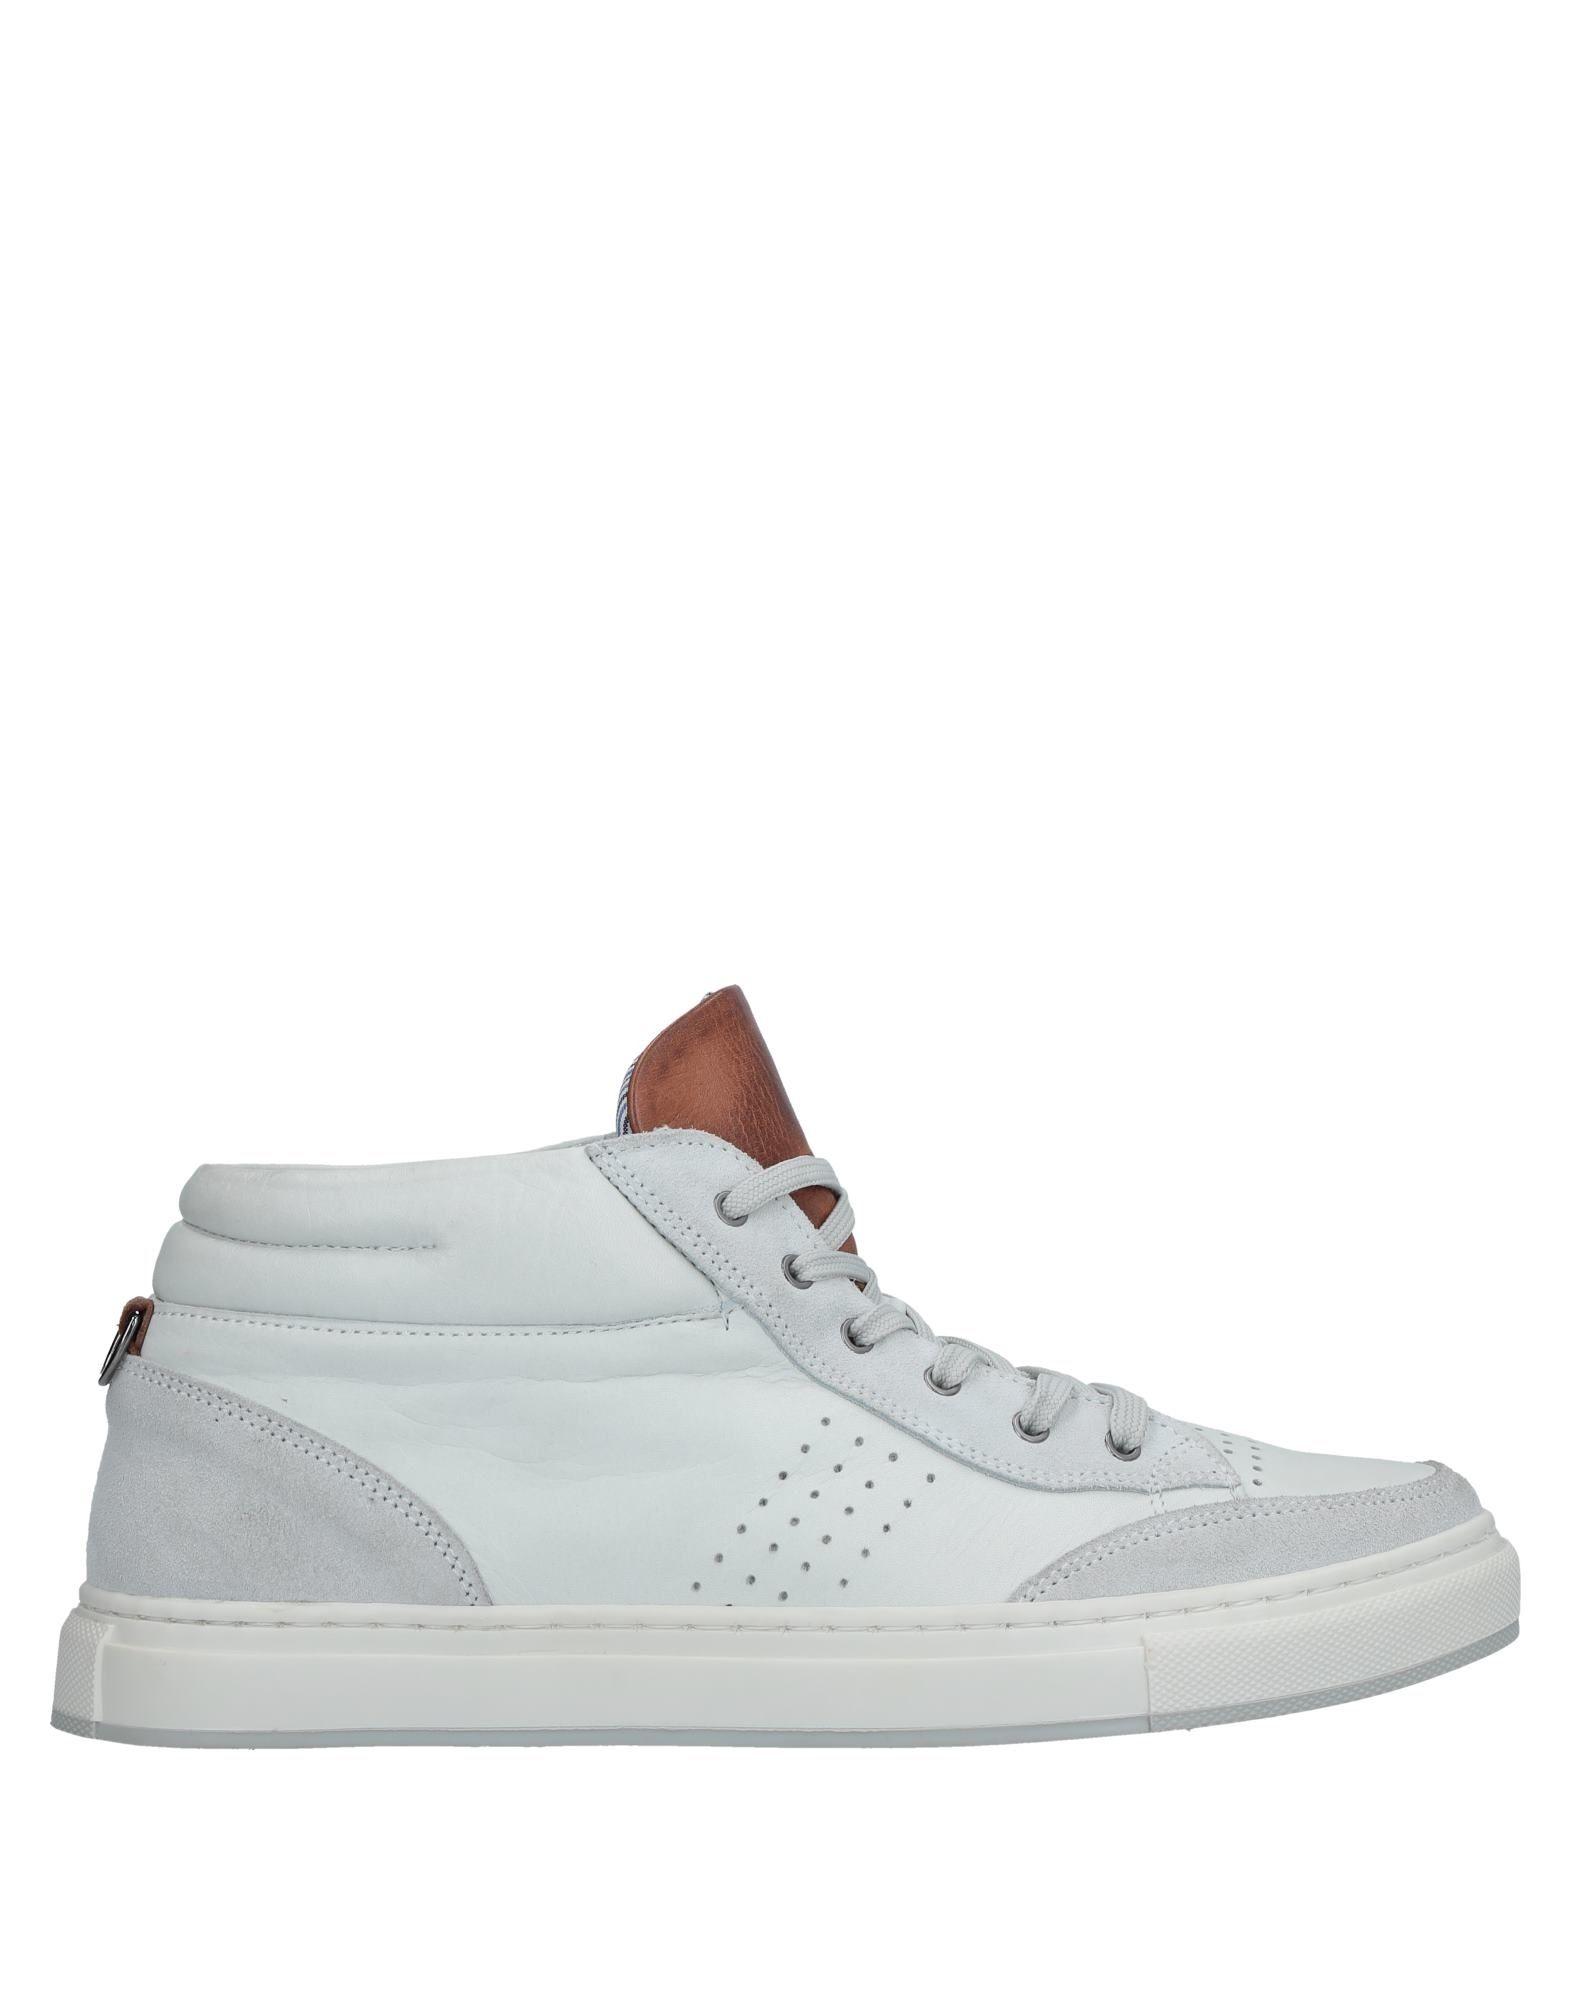 BRUNO VERRI | BRUNO VERRI High-tops & sneakers 11523568 | Goxip